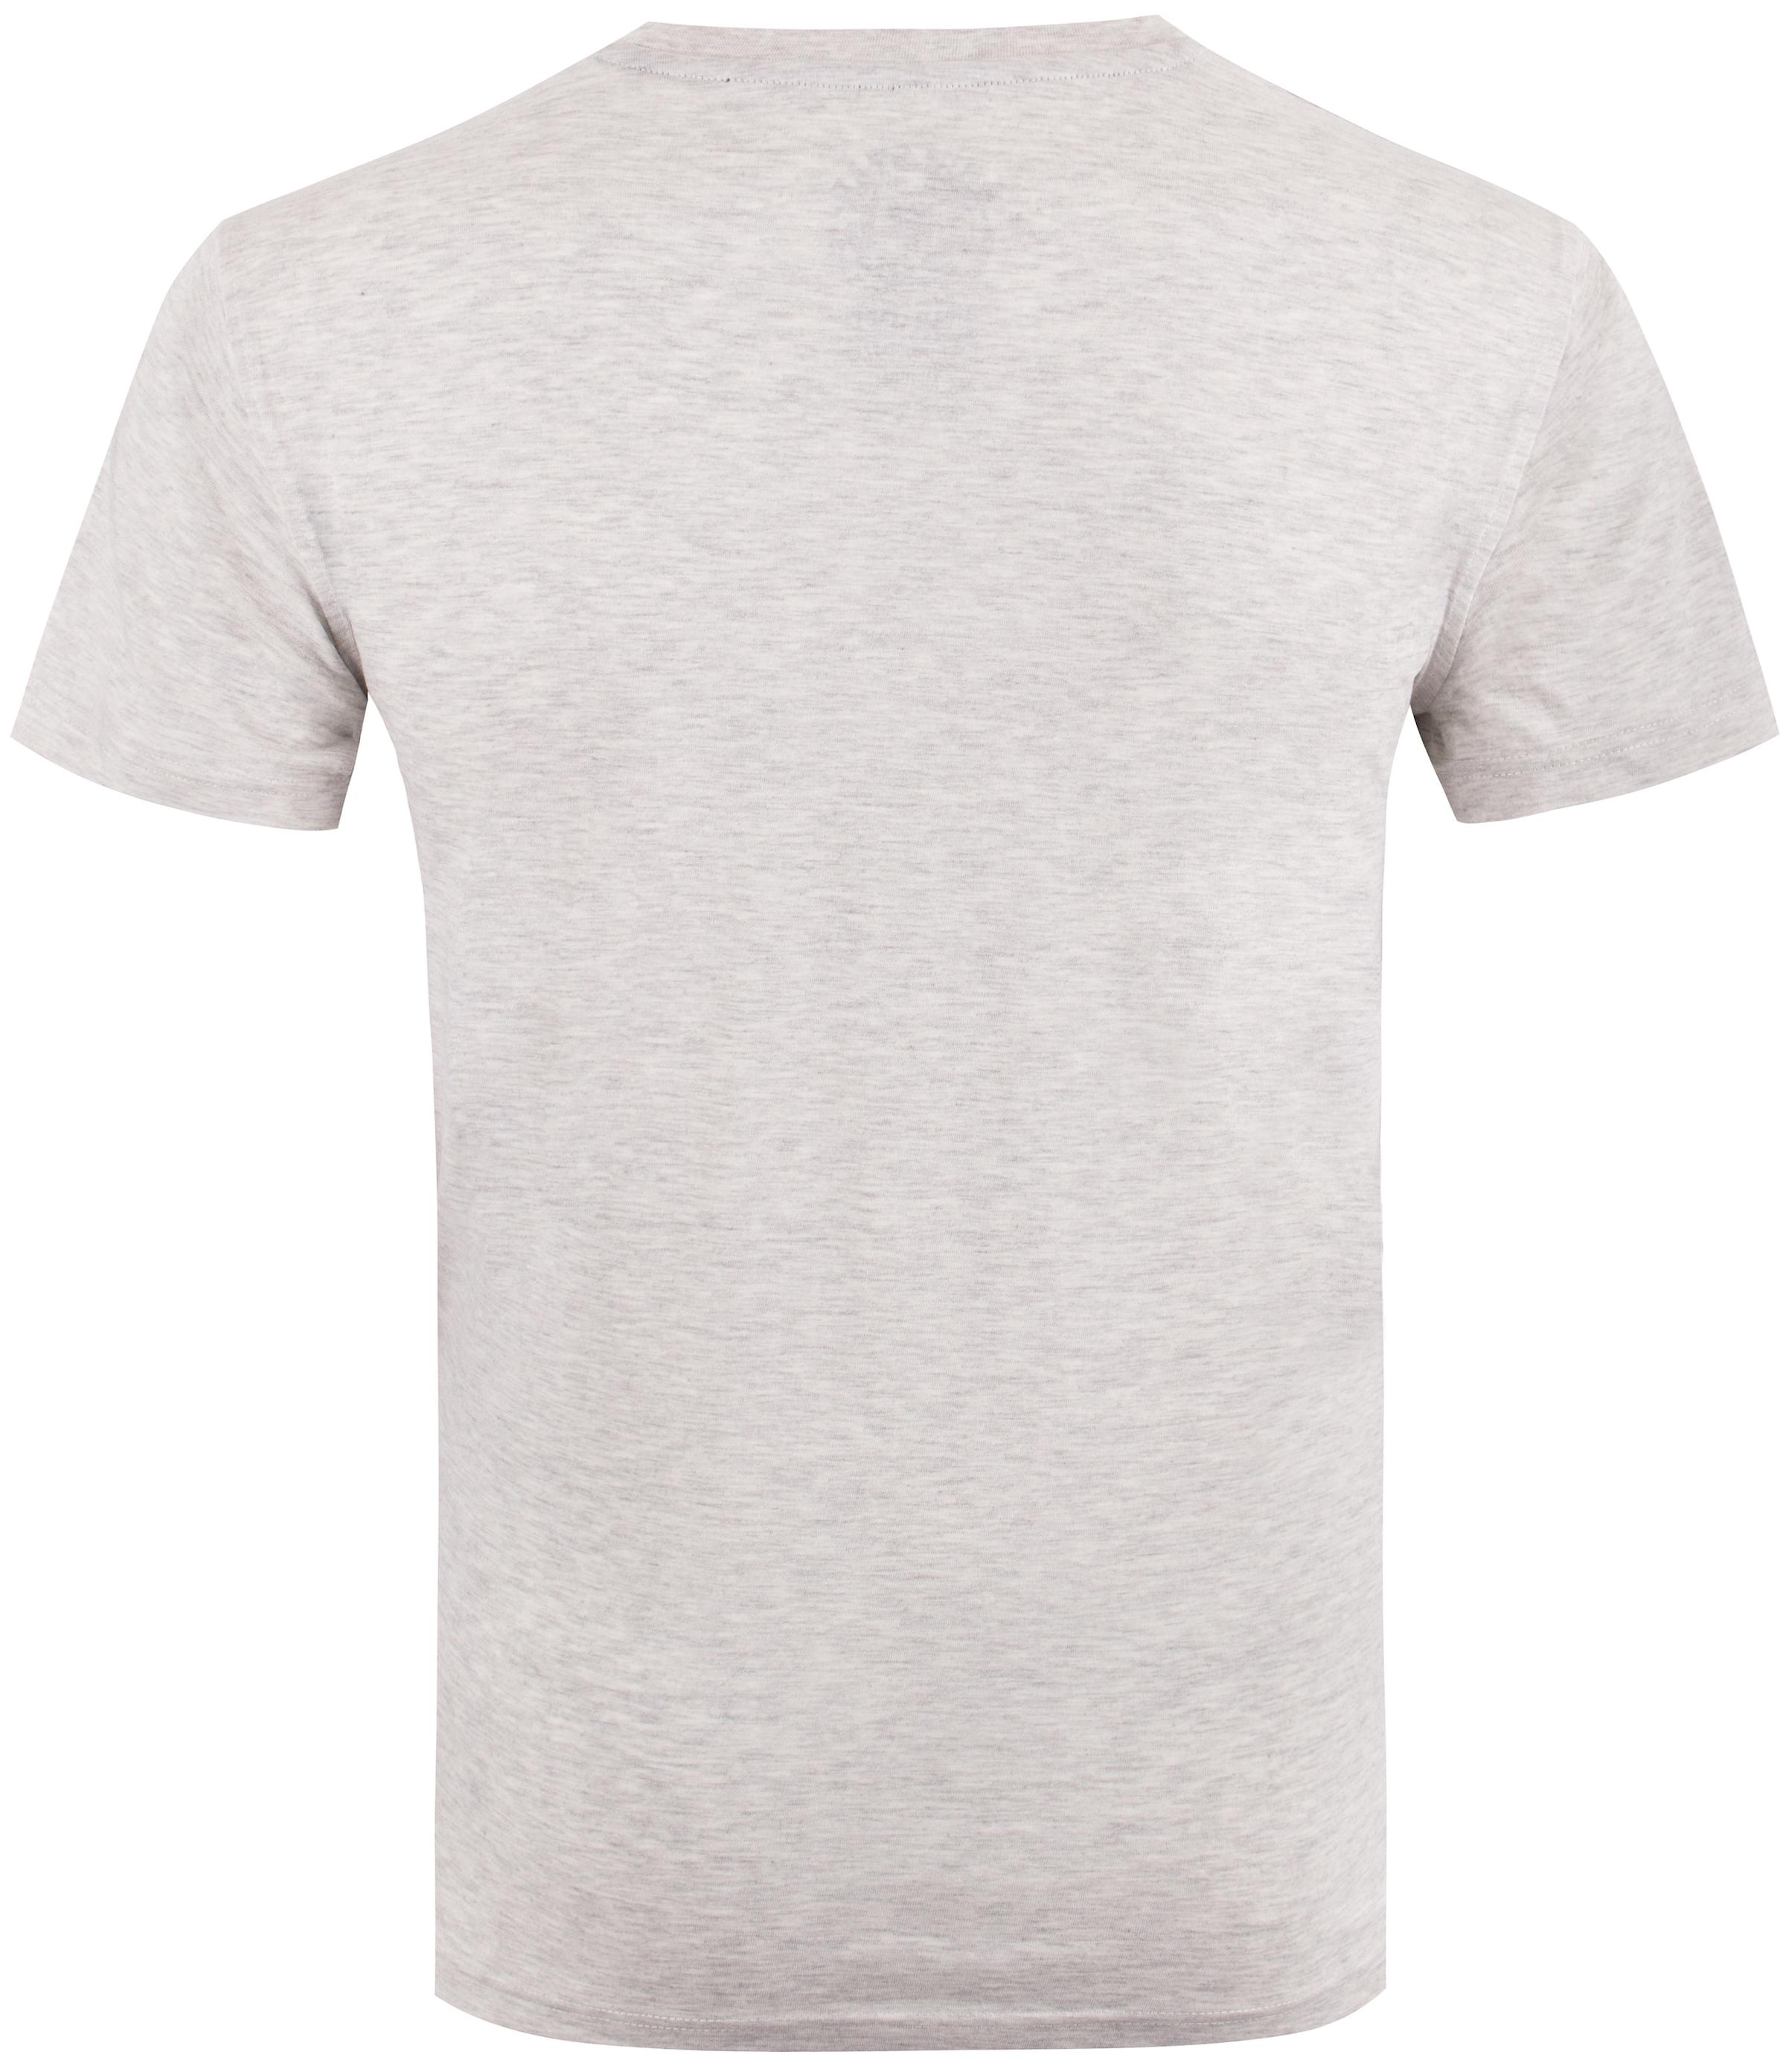 Shirt Soulstar In Gemêleerd Wit Shirt Soulstar ZiPXku